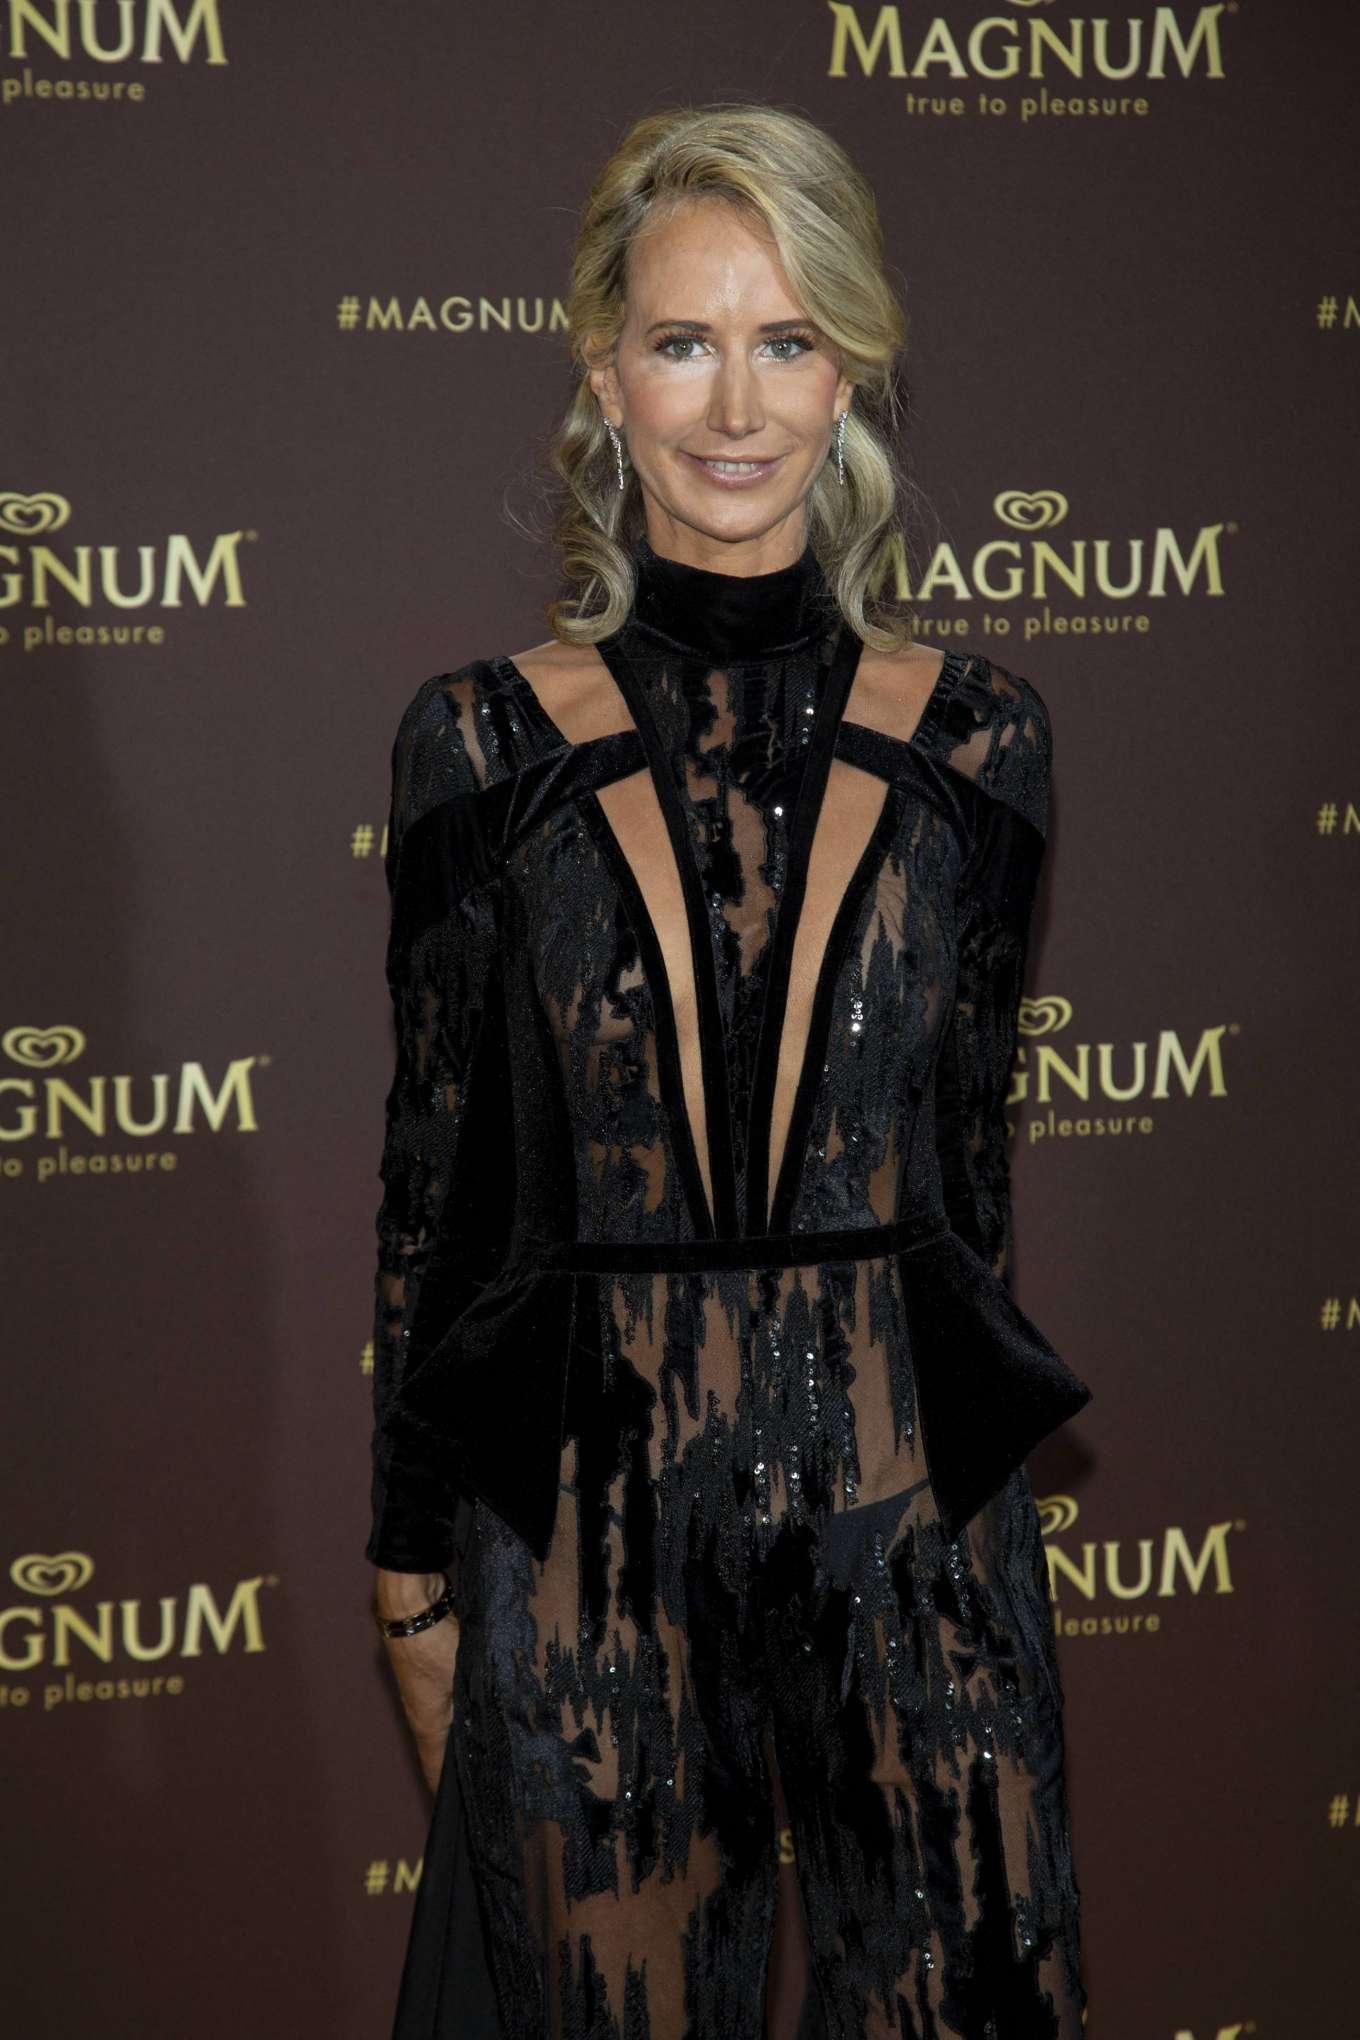 Lady Victoria Hervey - Magnum x Rita Ora Party at 2019 Cannes Film Festival